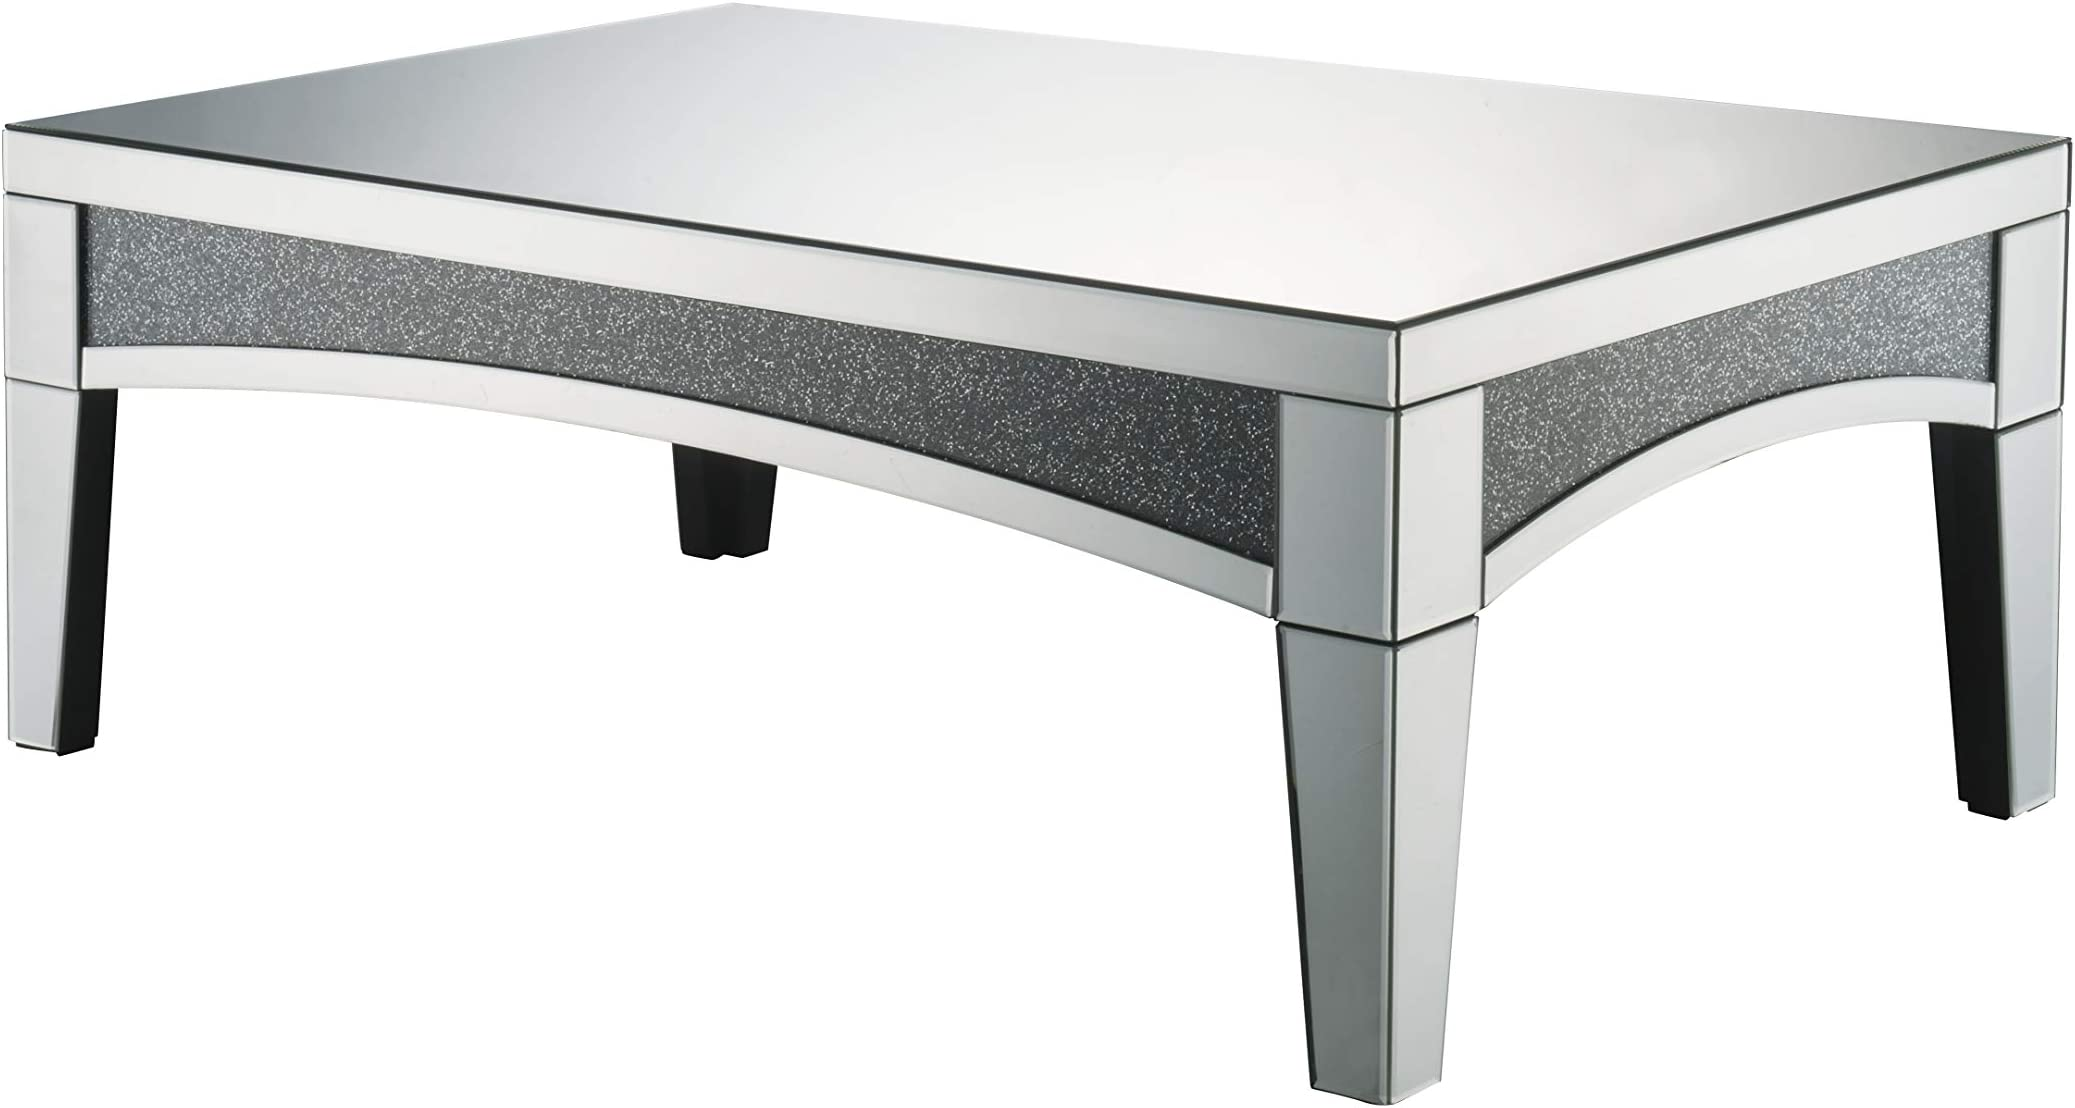 Amazon Com Acme Furniture Coffee Table Mirrored Furniture Decor